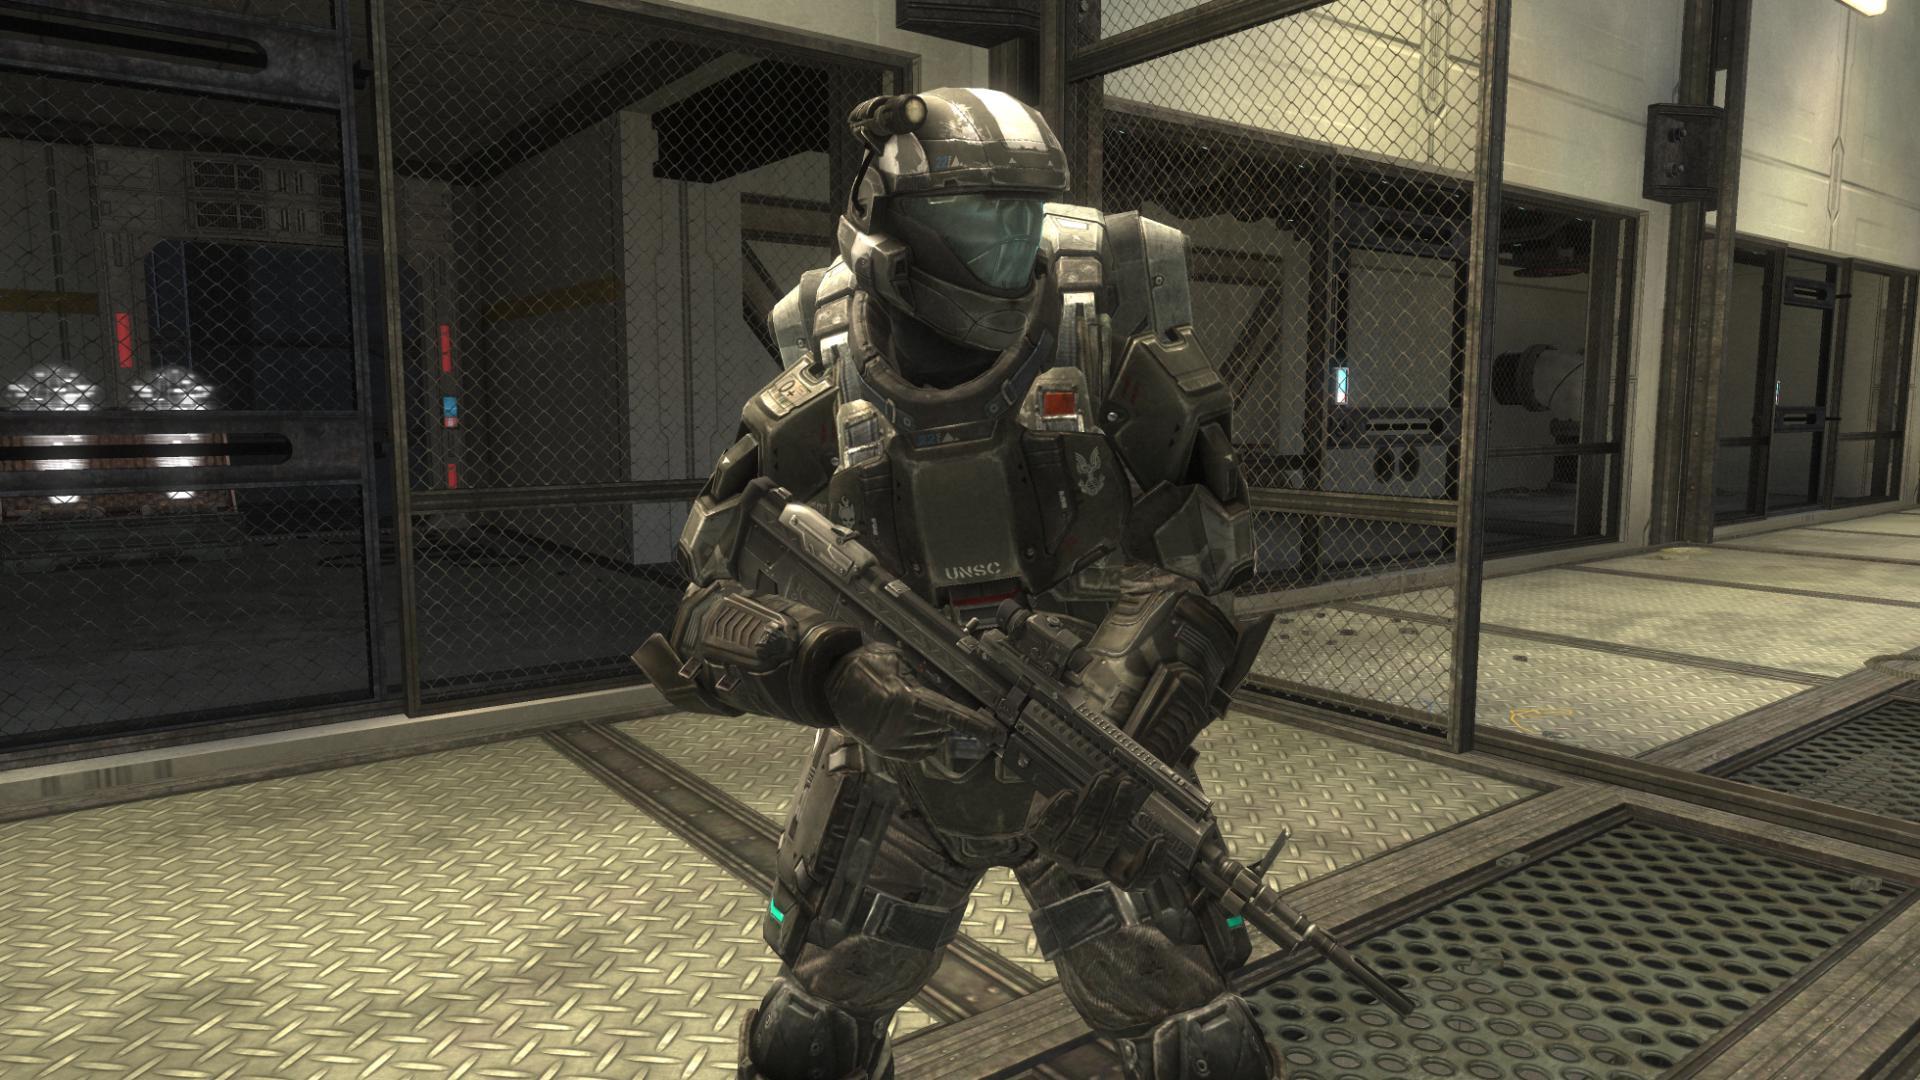 ODST vs REACH! (Halo One V One) - YouTube